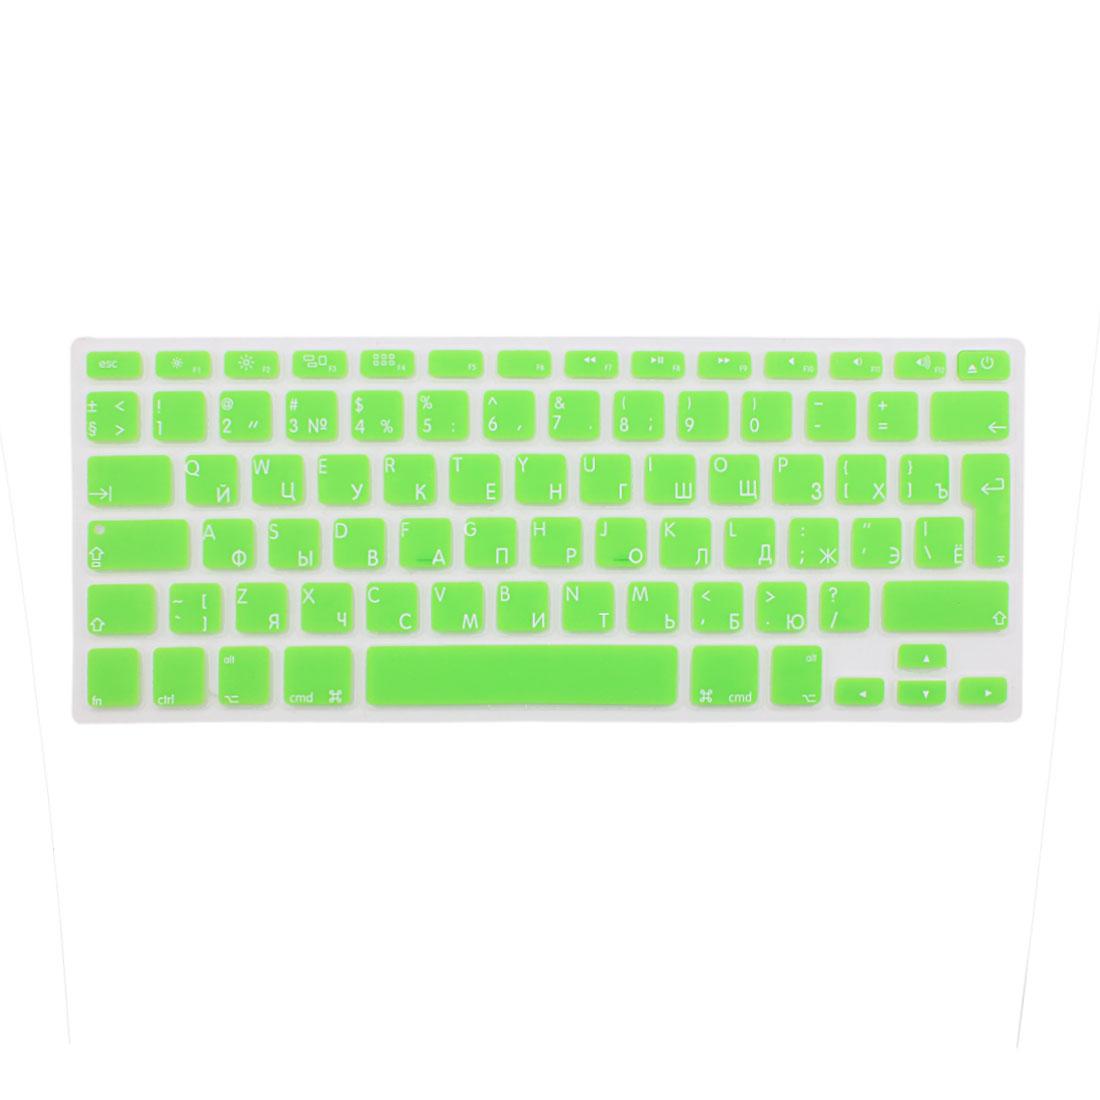 "Russian Silicone Keyboard Skin Cover Green for Apple Macbook Air 13""15""17"" EU"